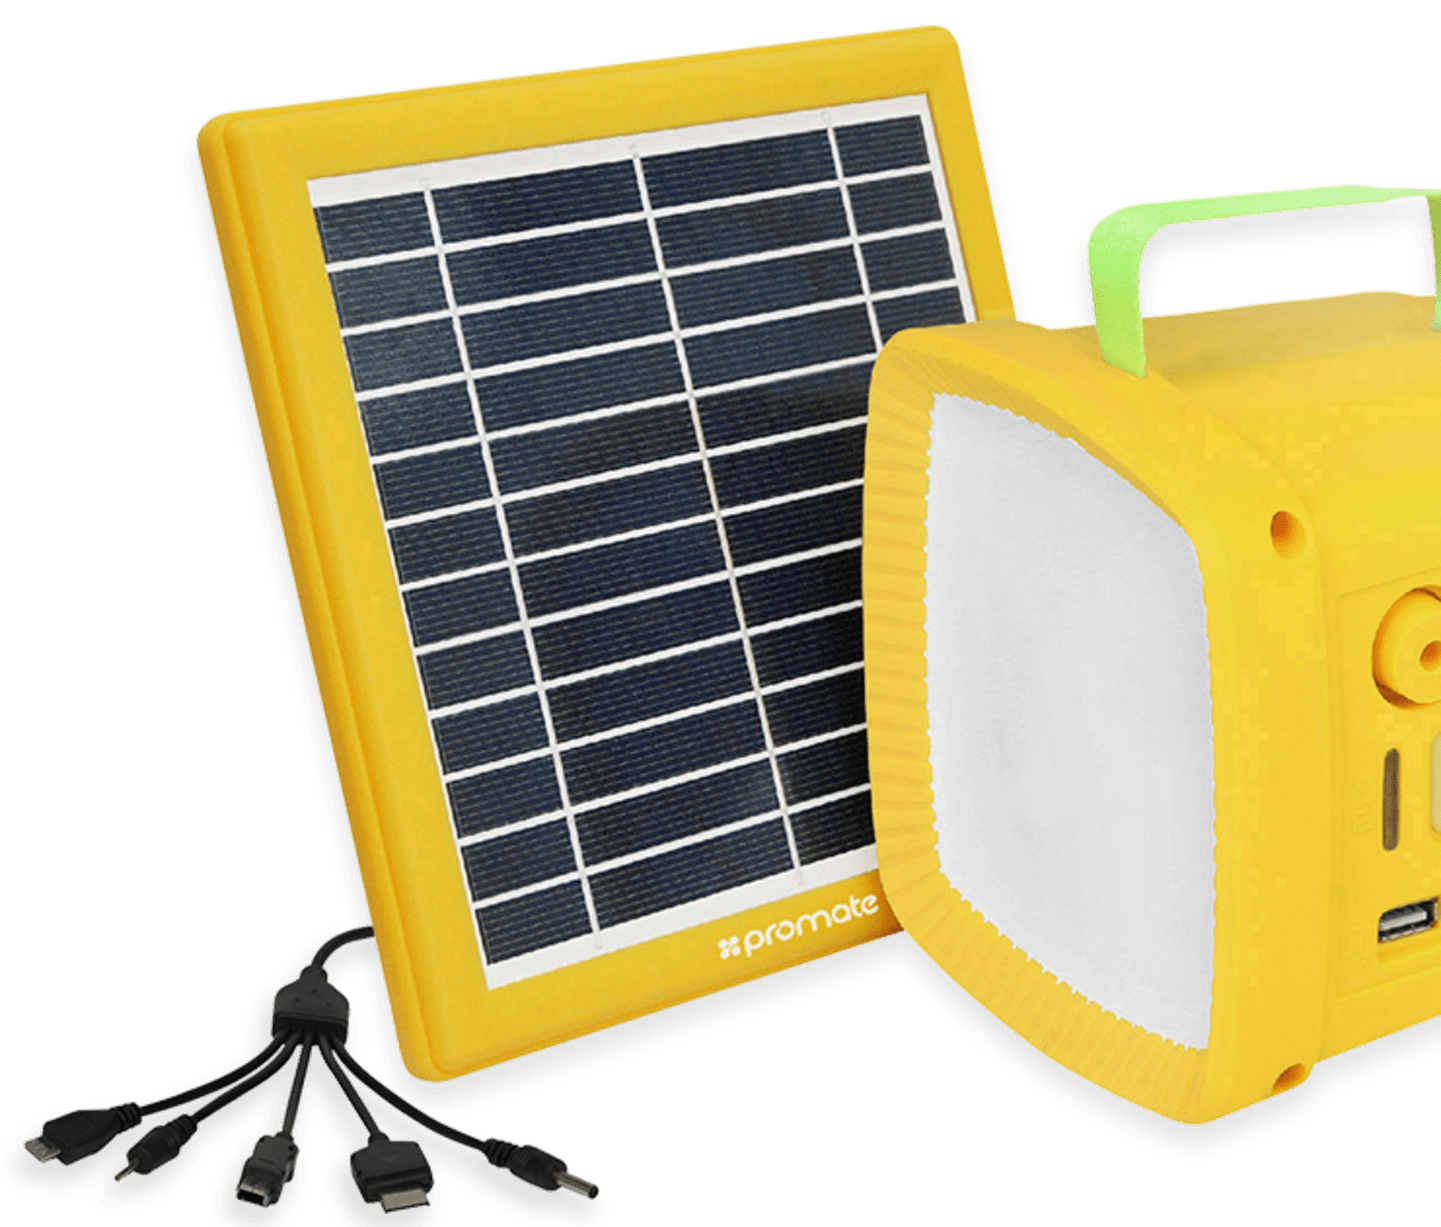 Pro Mate - SolarTorch1 SolarTorch-1 LED Camping-Leuchte »